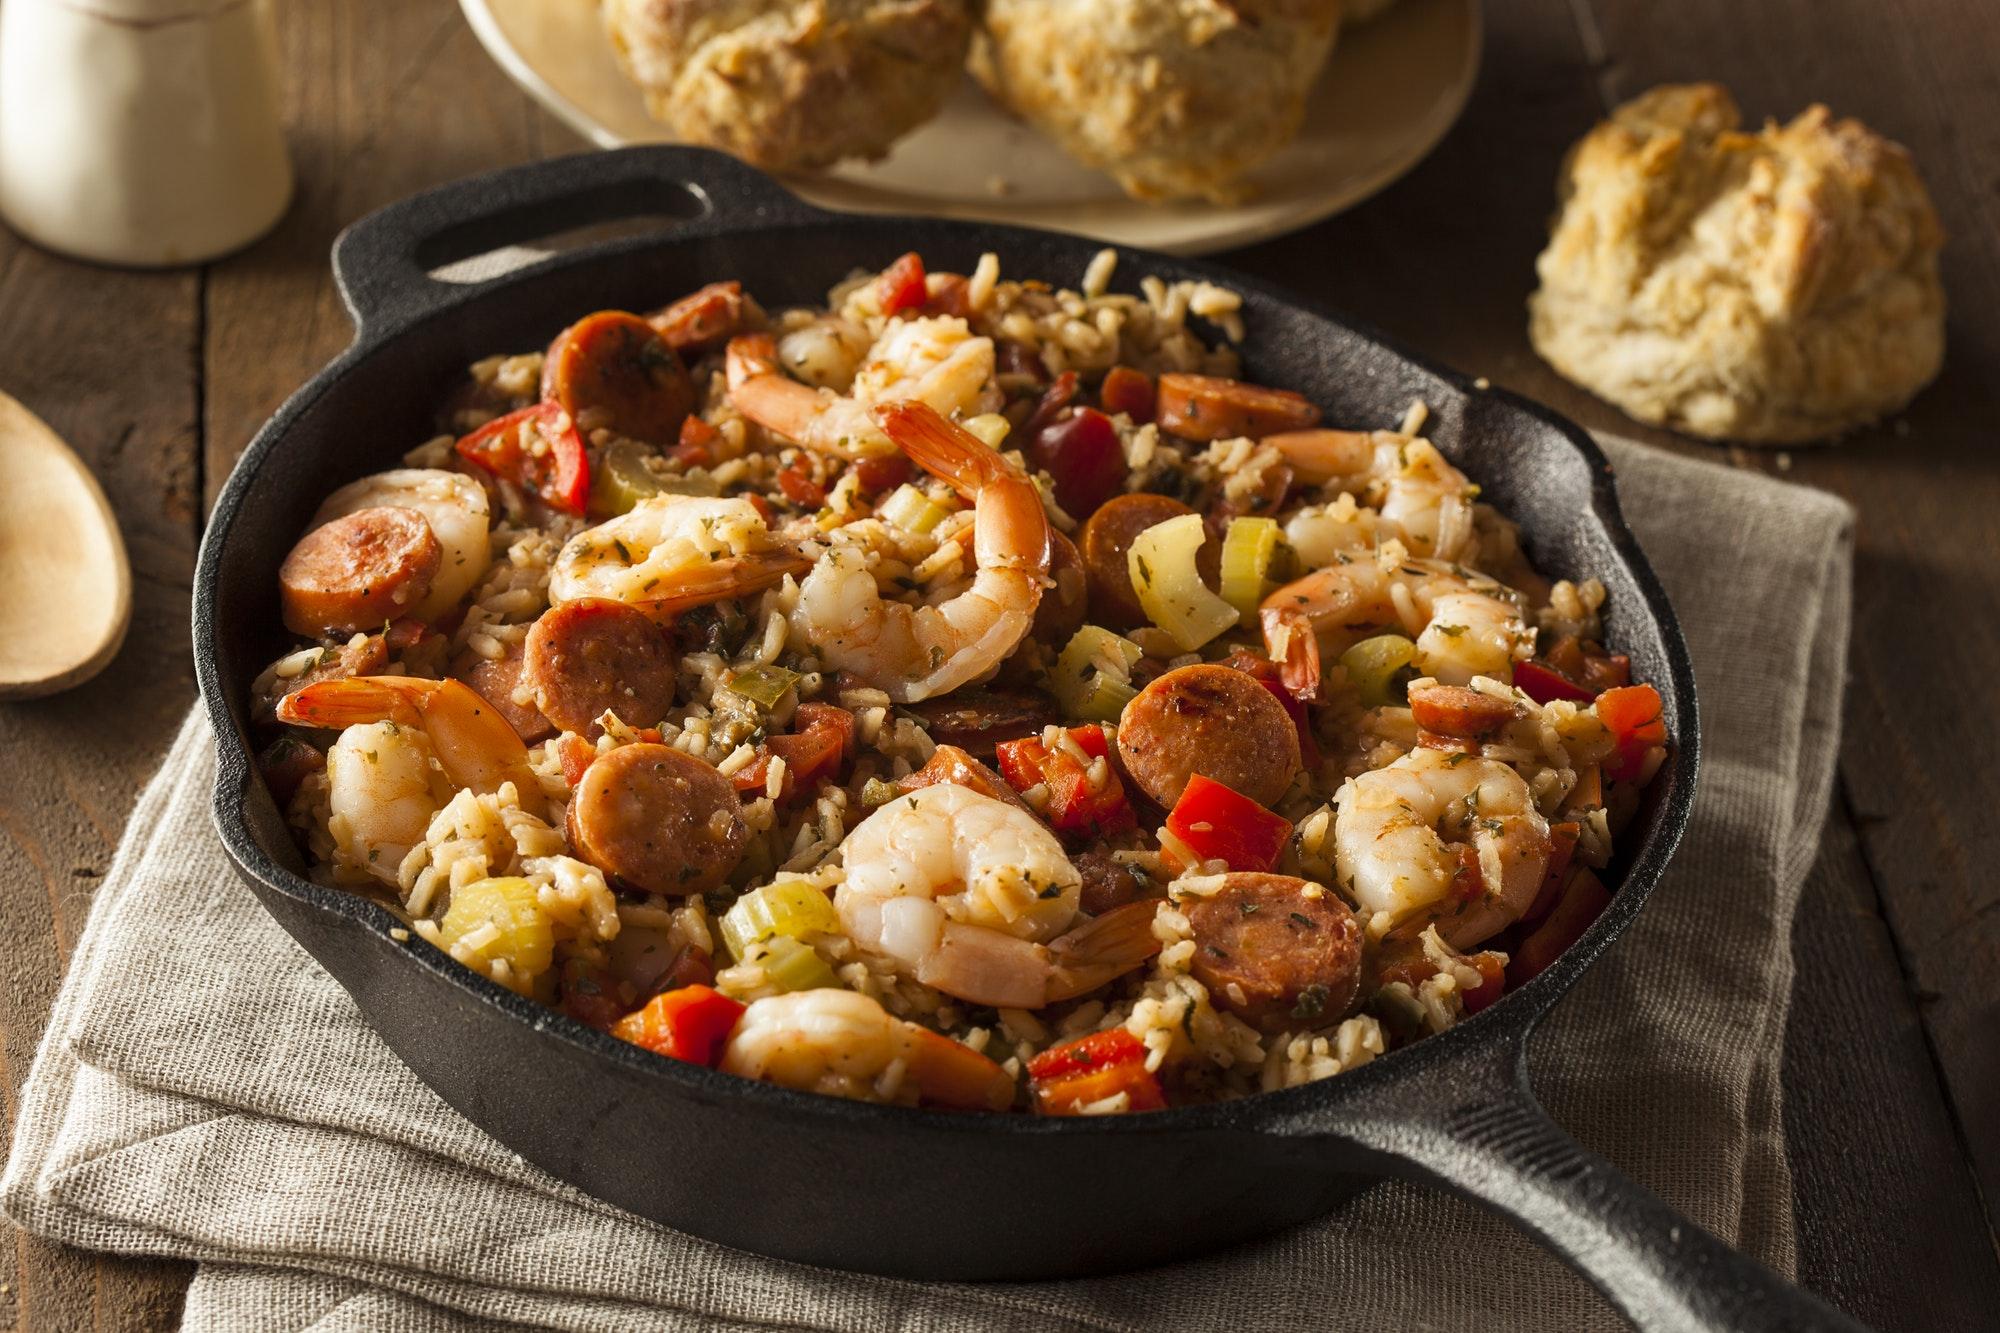 Spicy Homemade Cajun Jambalaya continental breakfasts